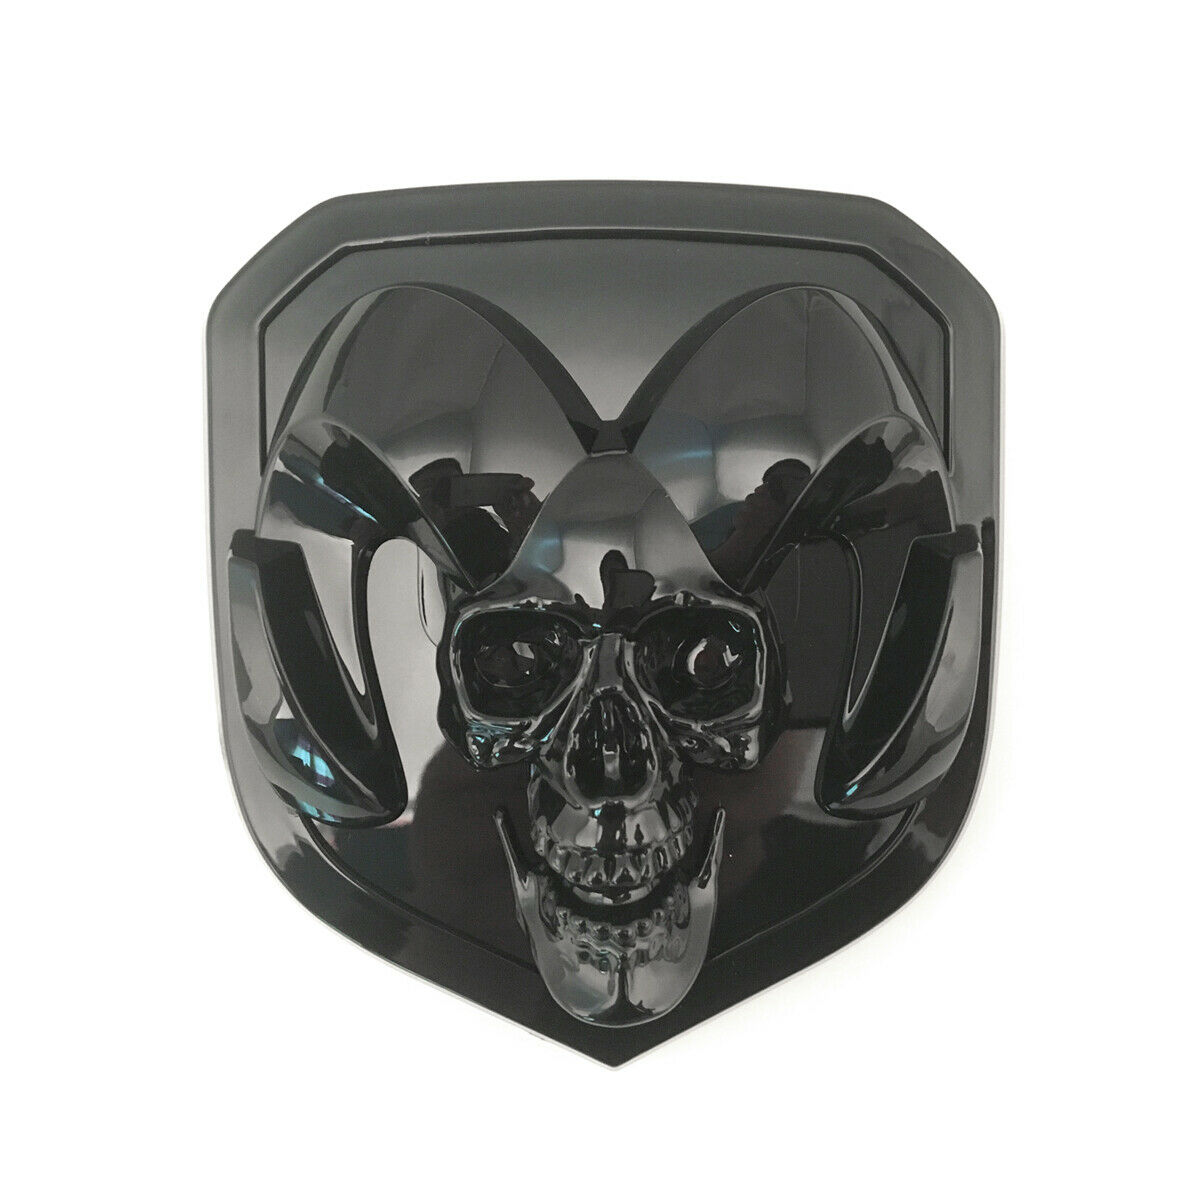 2013-2018 Dodge Ram 1500 2500 3500 Mopar Black 3D Skull RAM Head Grille Emblem